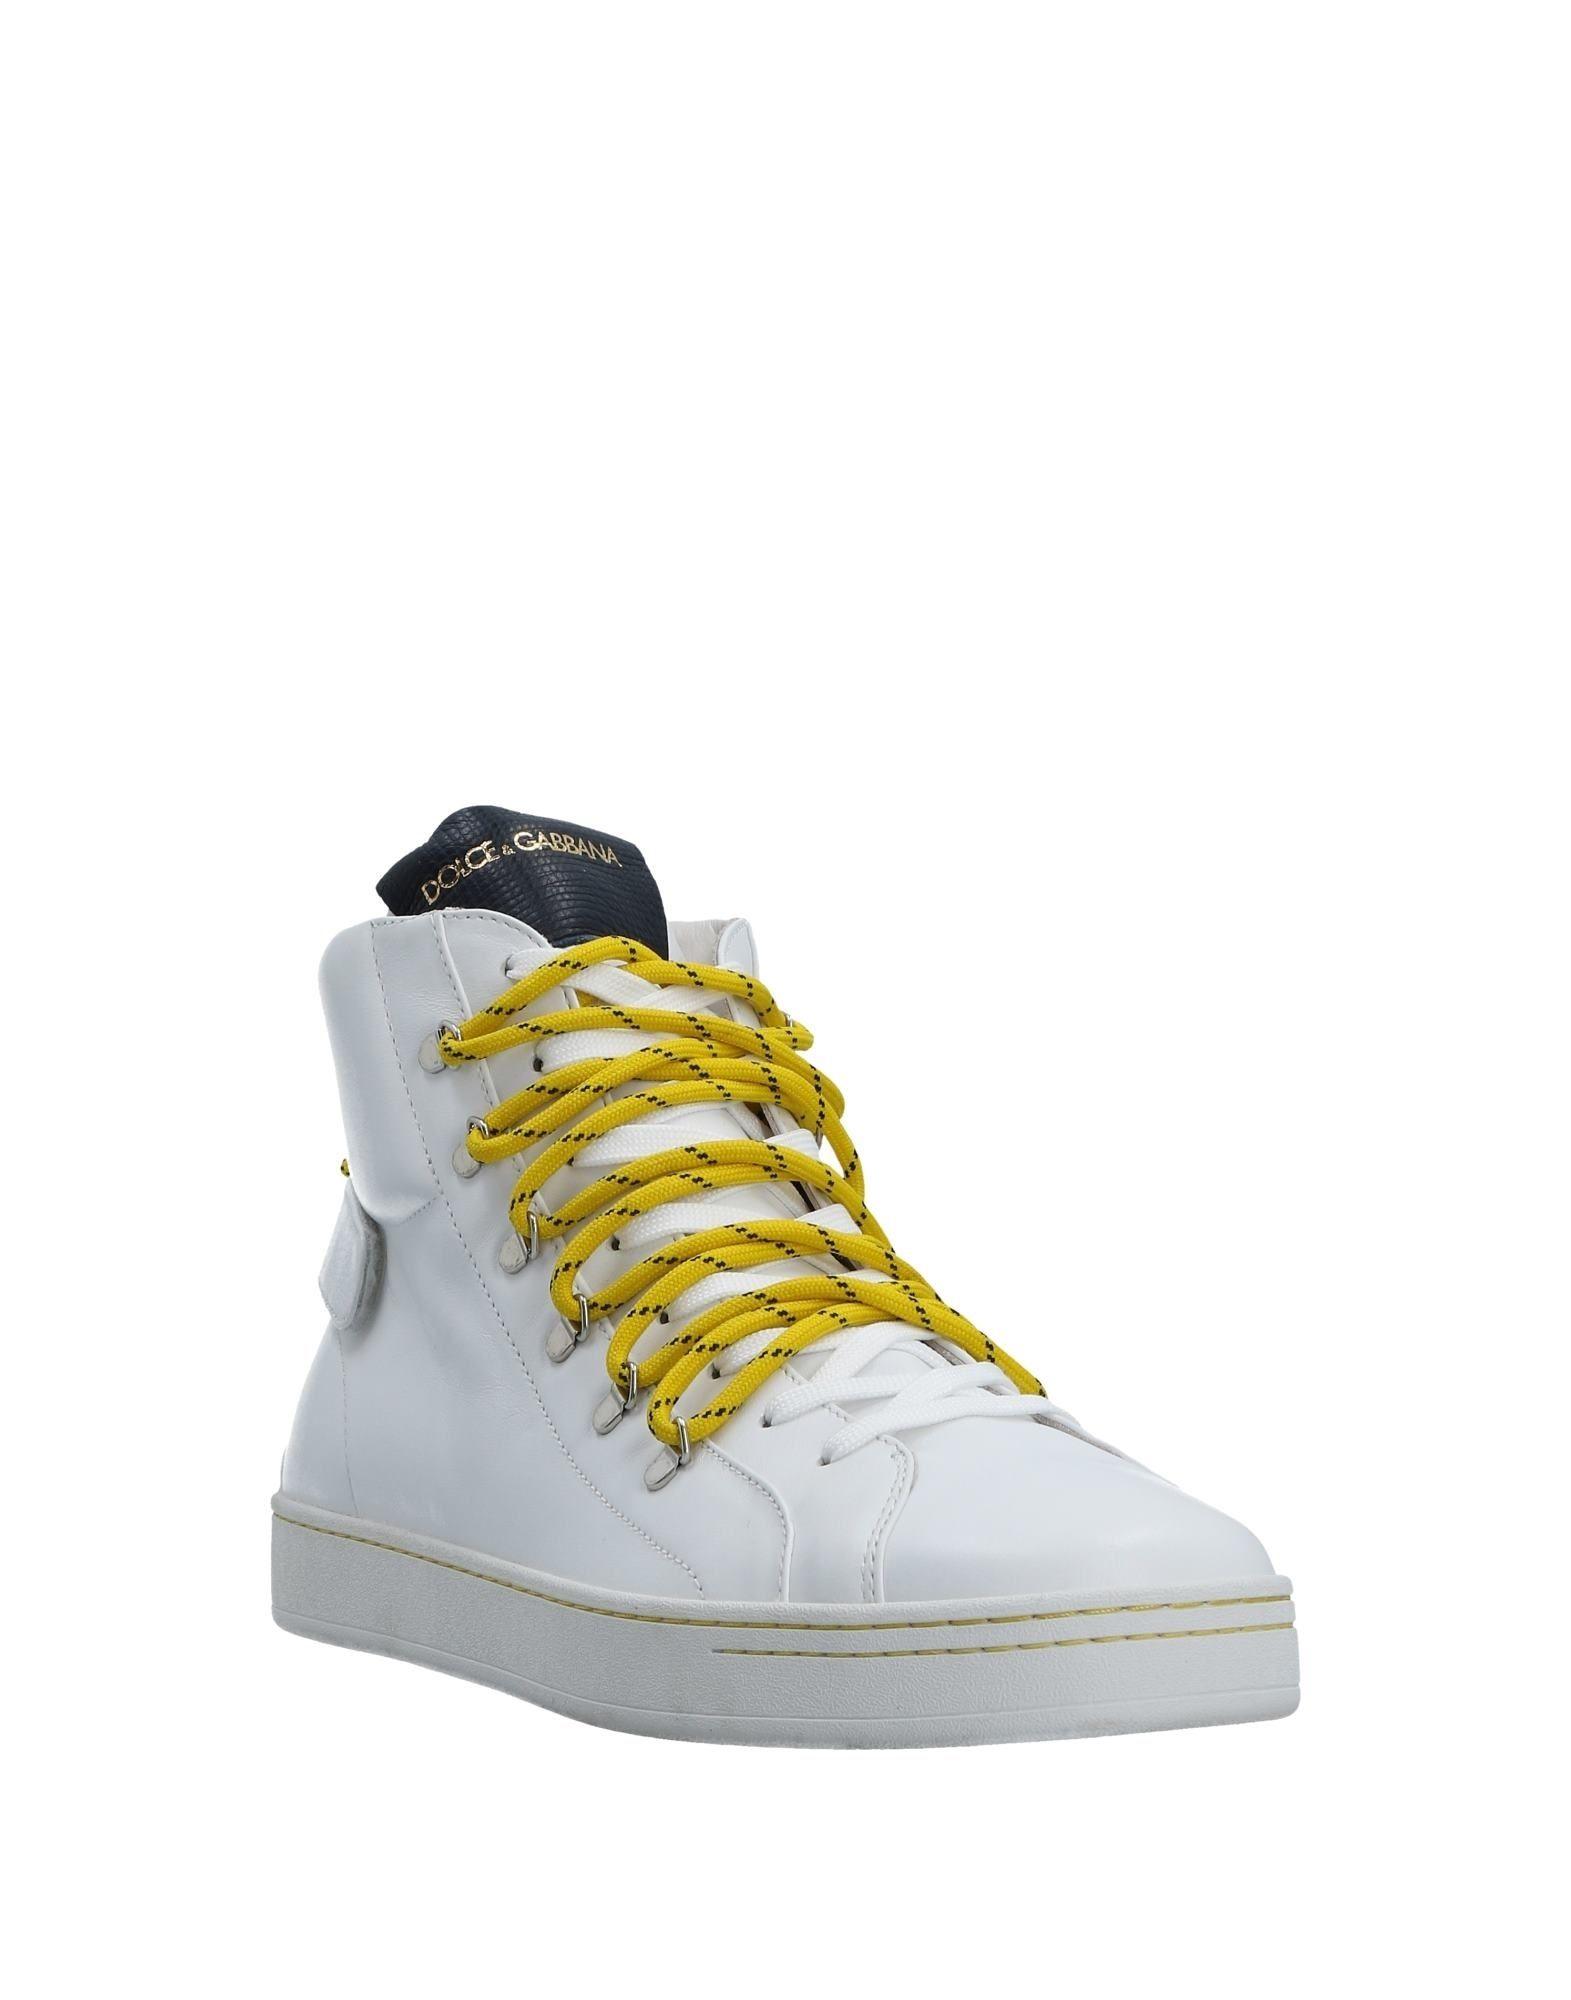 Dolce & Gabbana Sneakers Herren  11530258CV Gute Qualität beliebte Schuhe